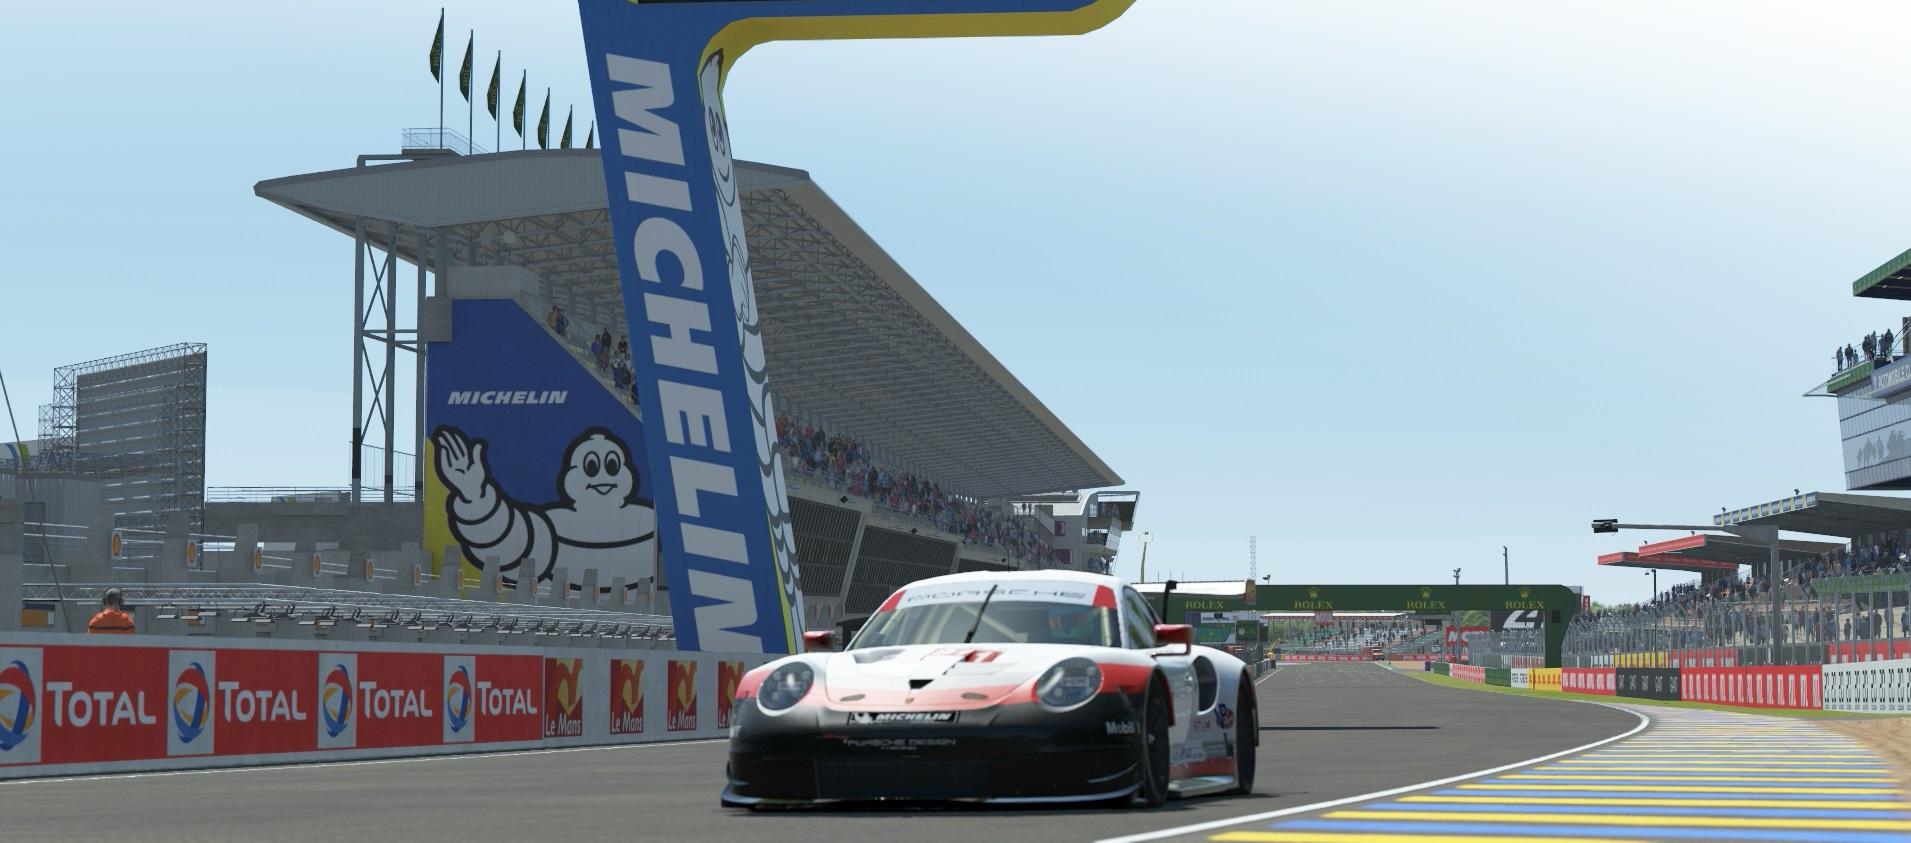 Michelin, big in the world of sim racing